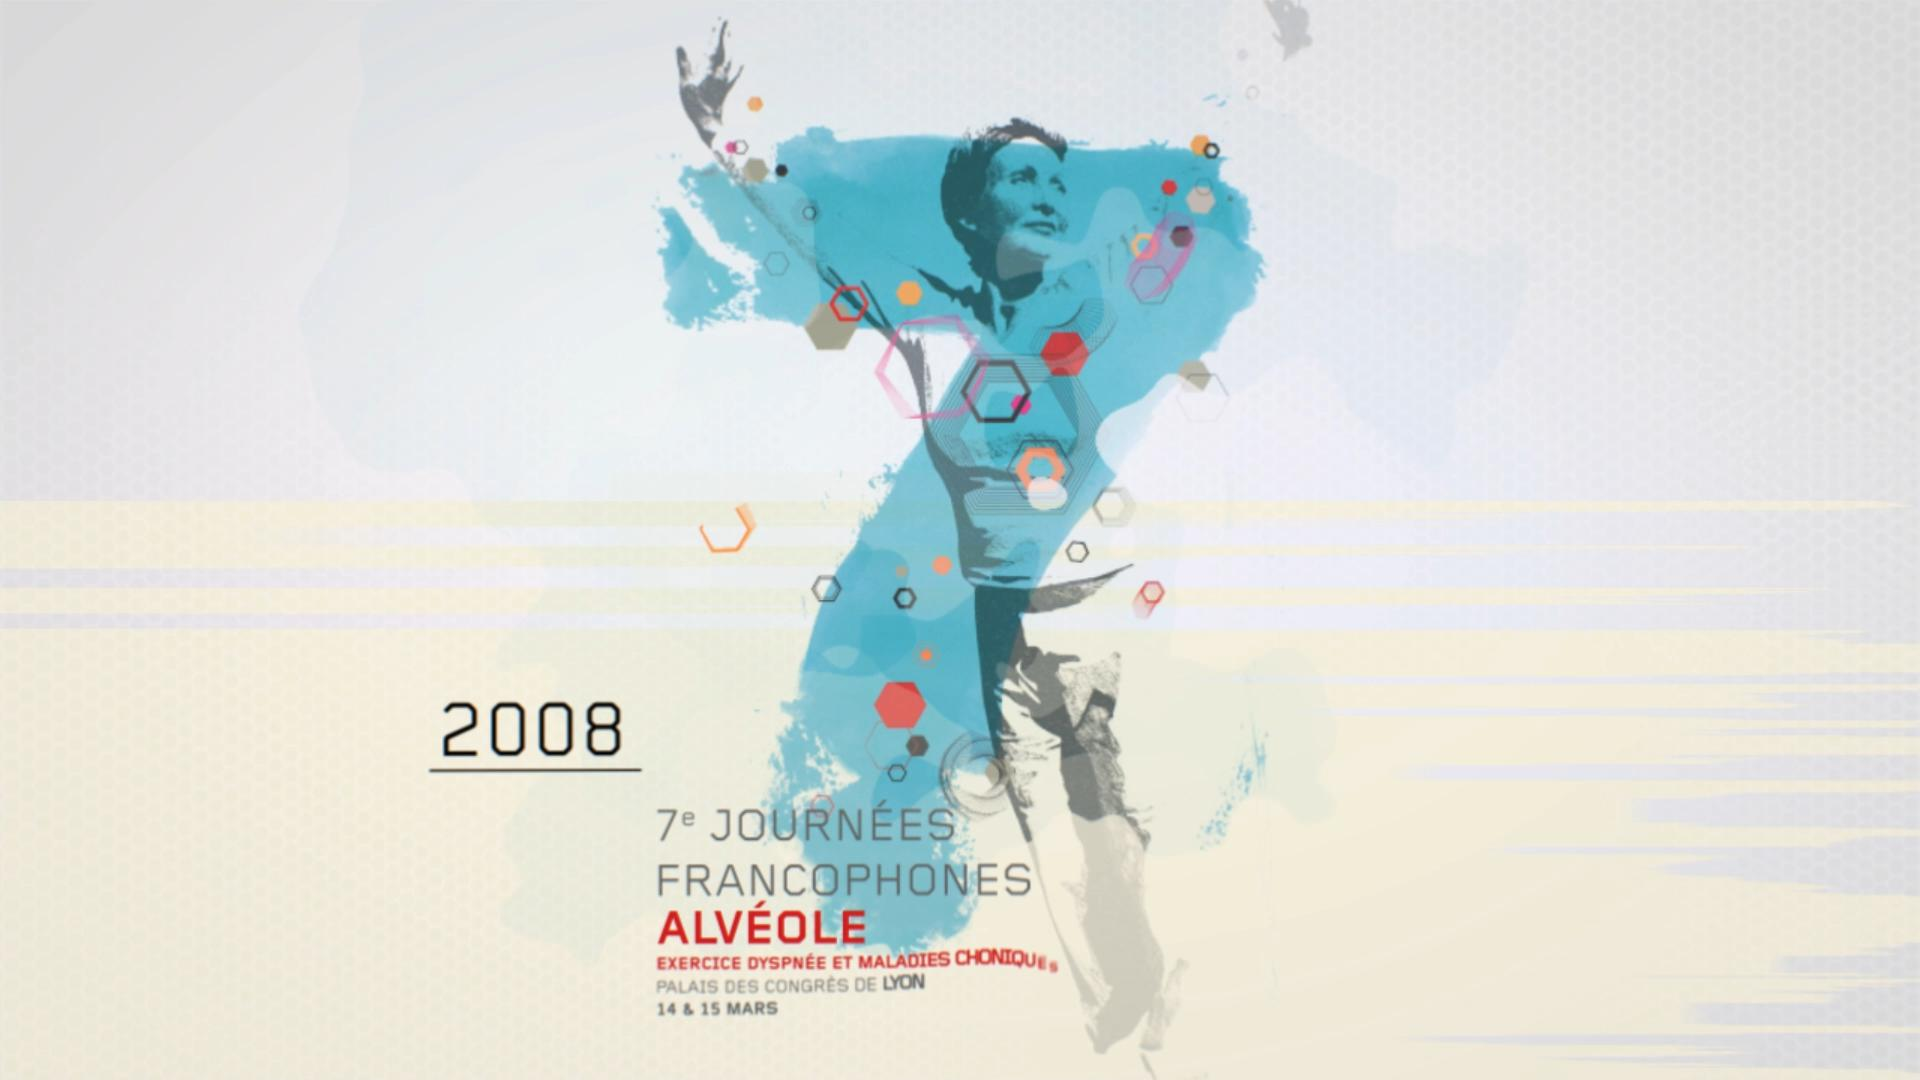 4 Alveole 2008